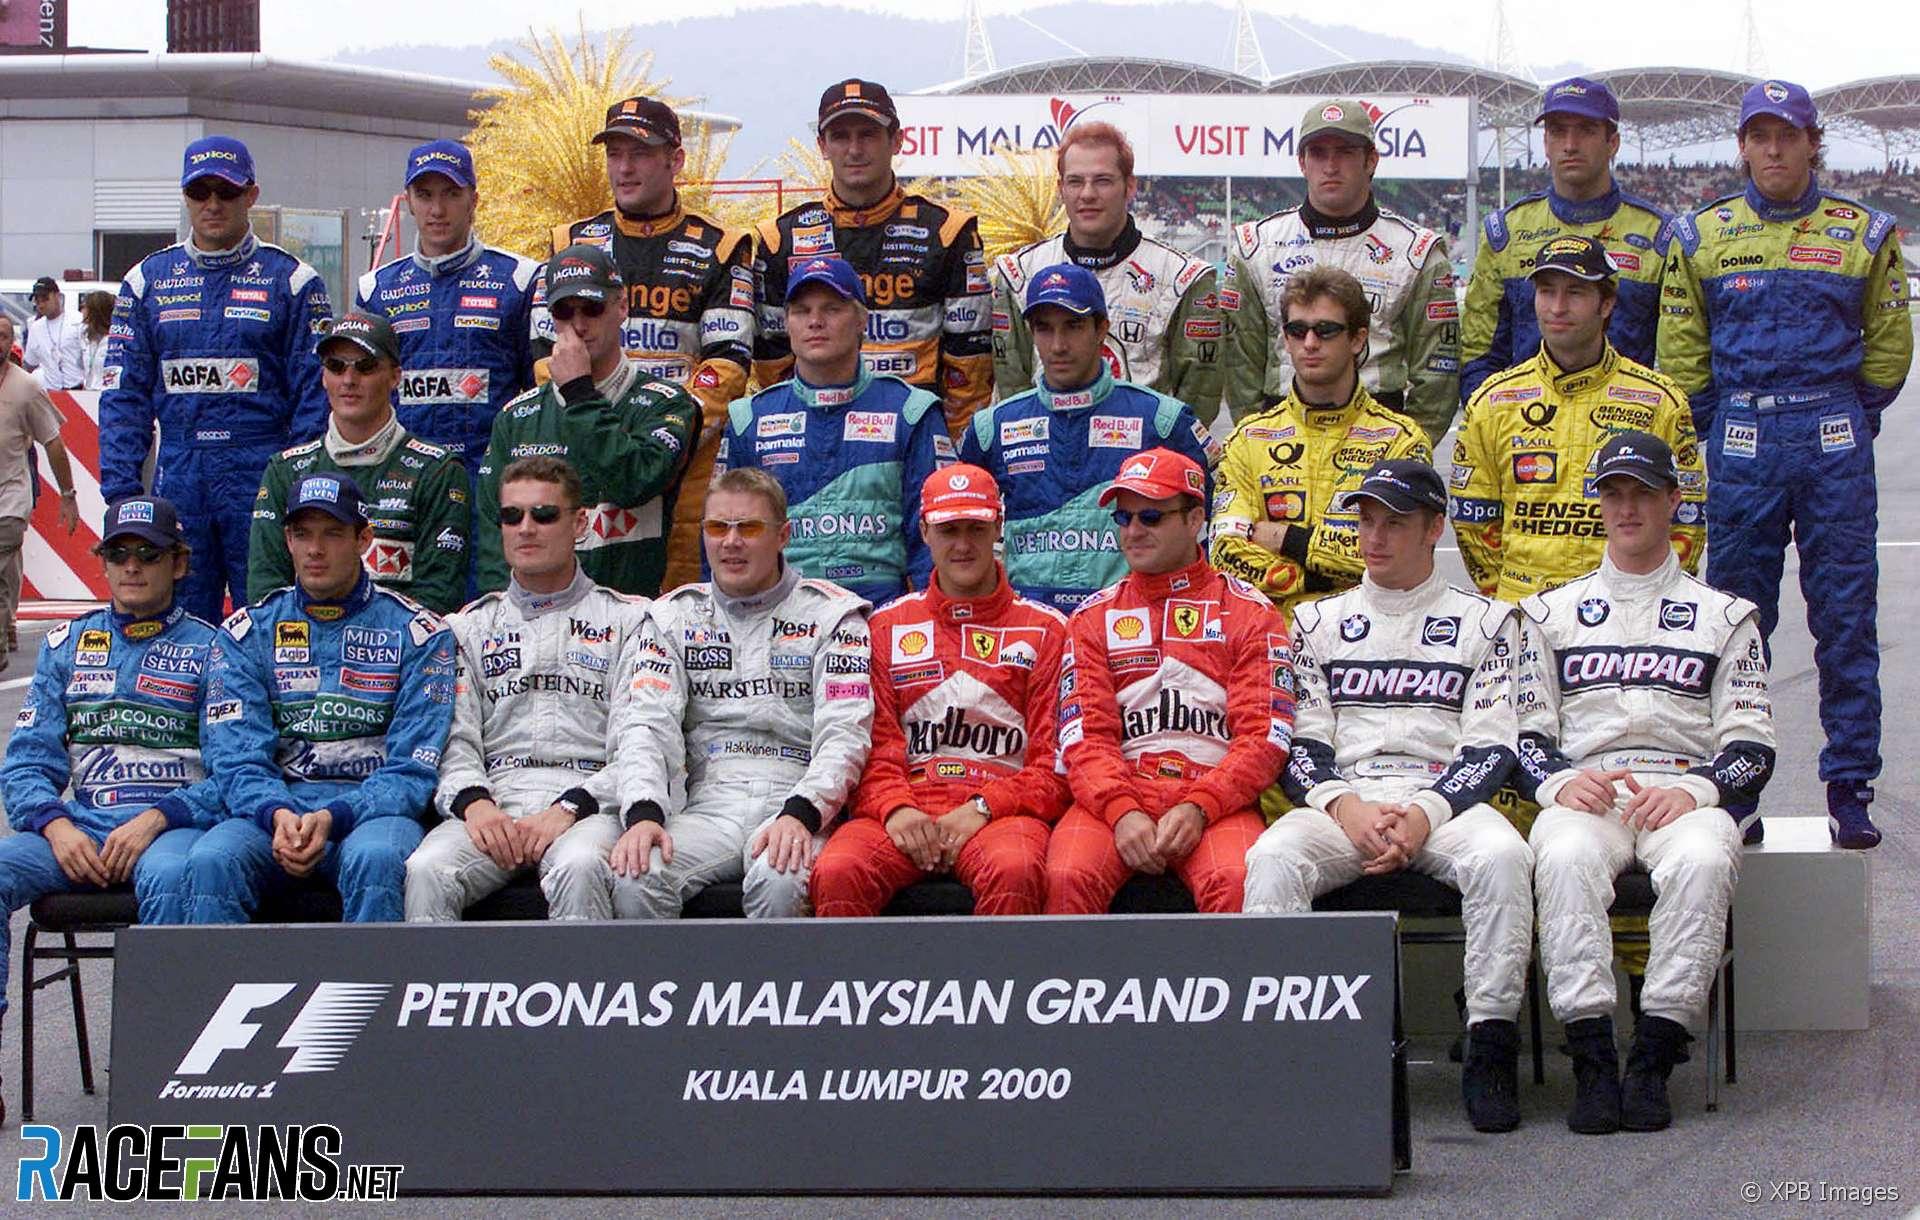 F1 drivers end-of-season photograph, 2000